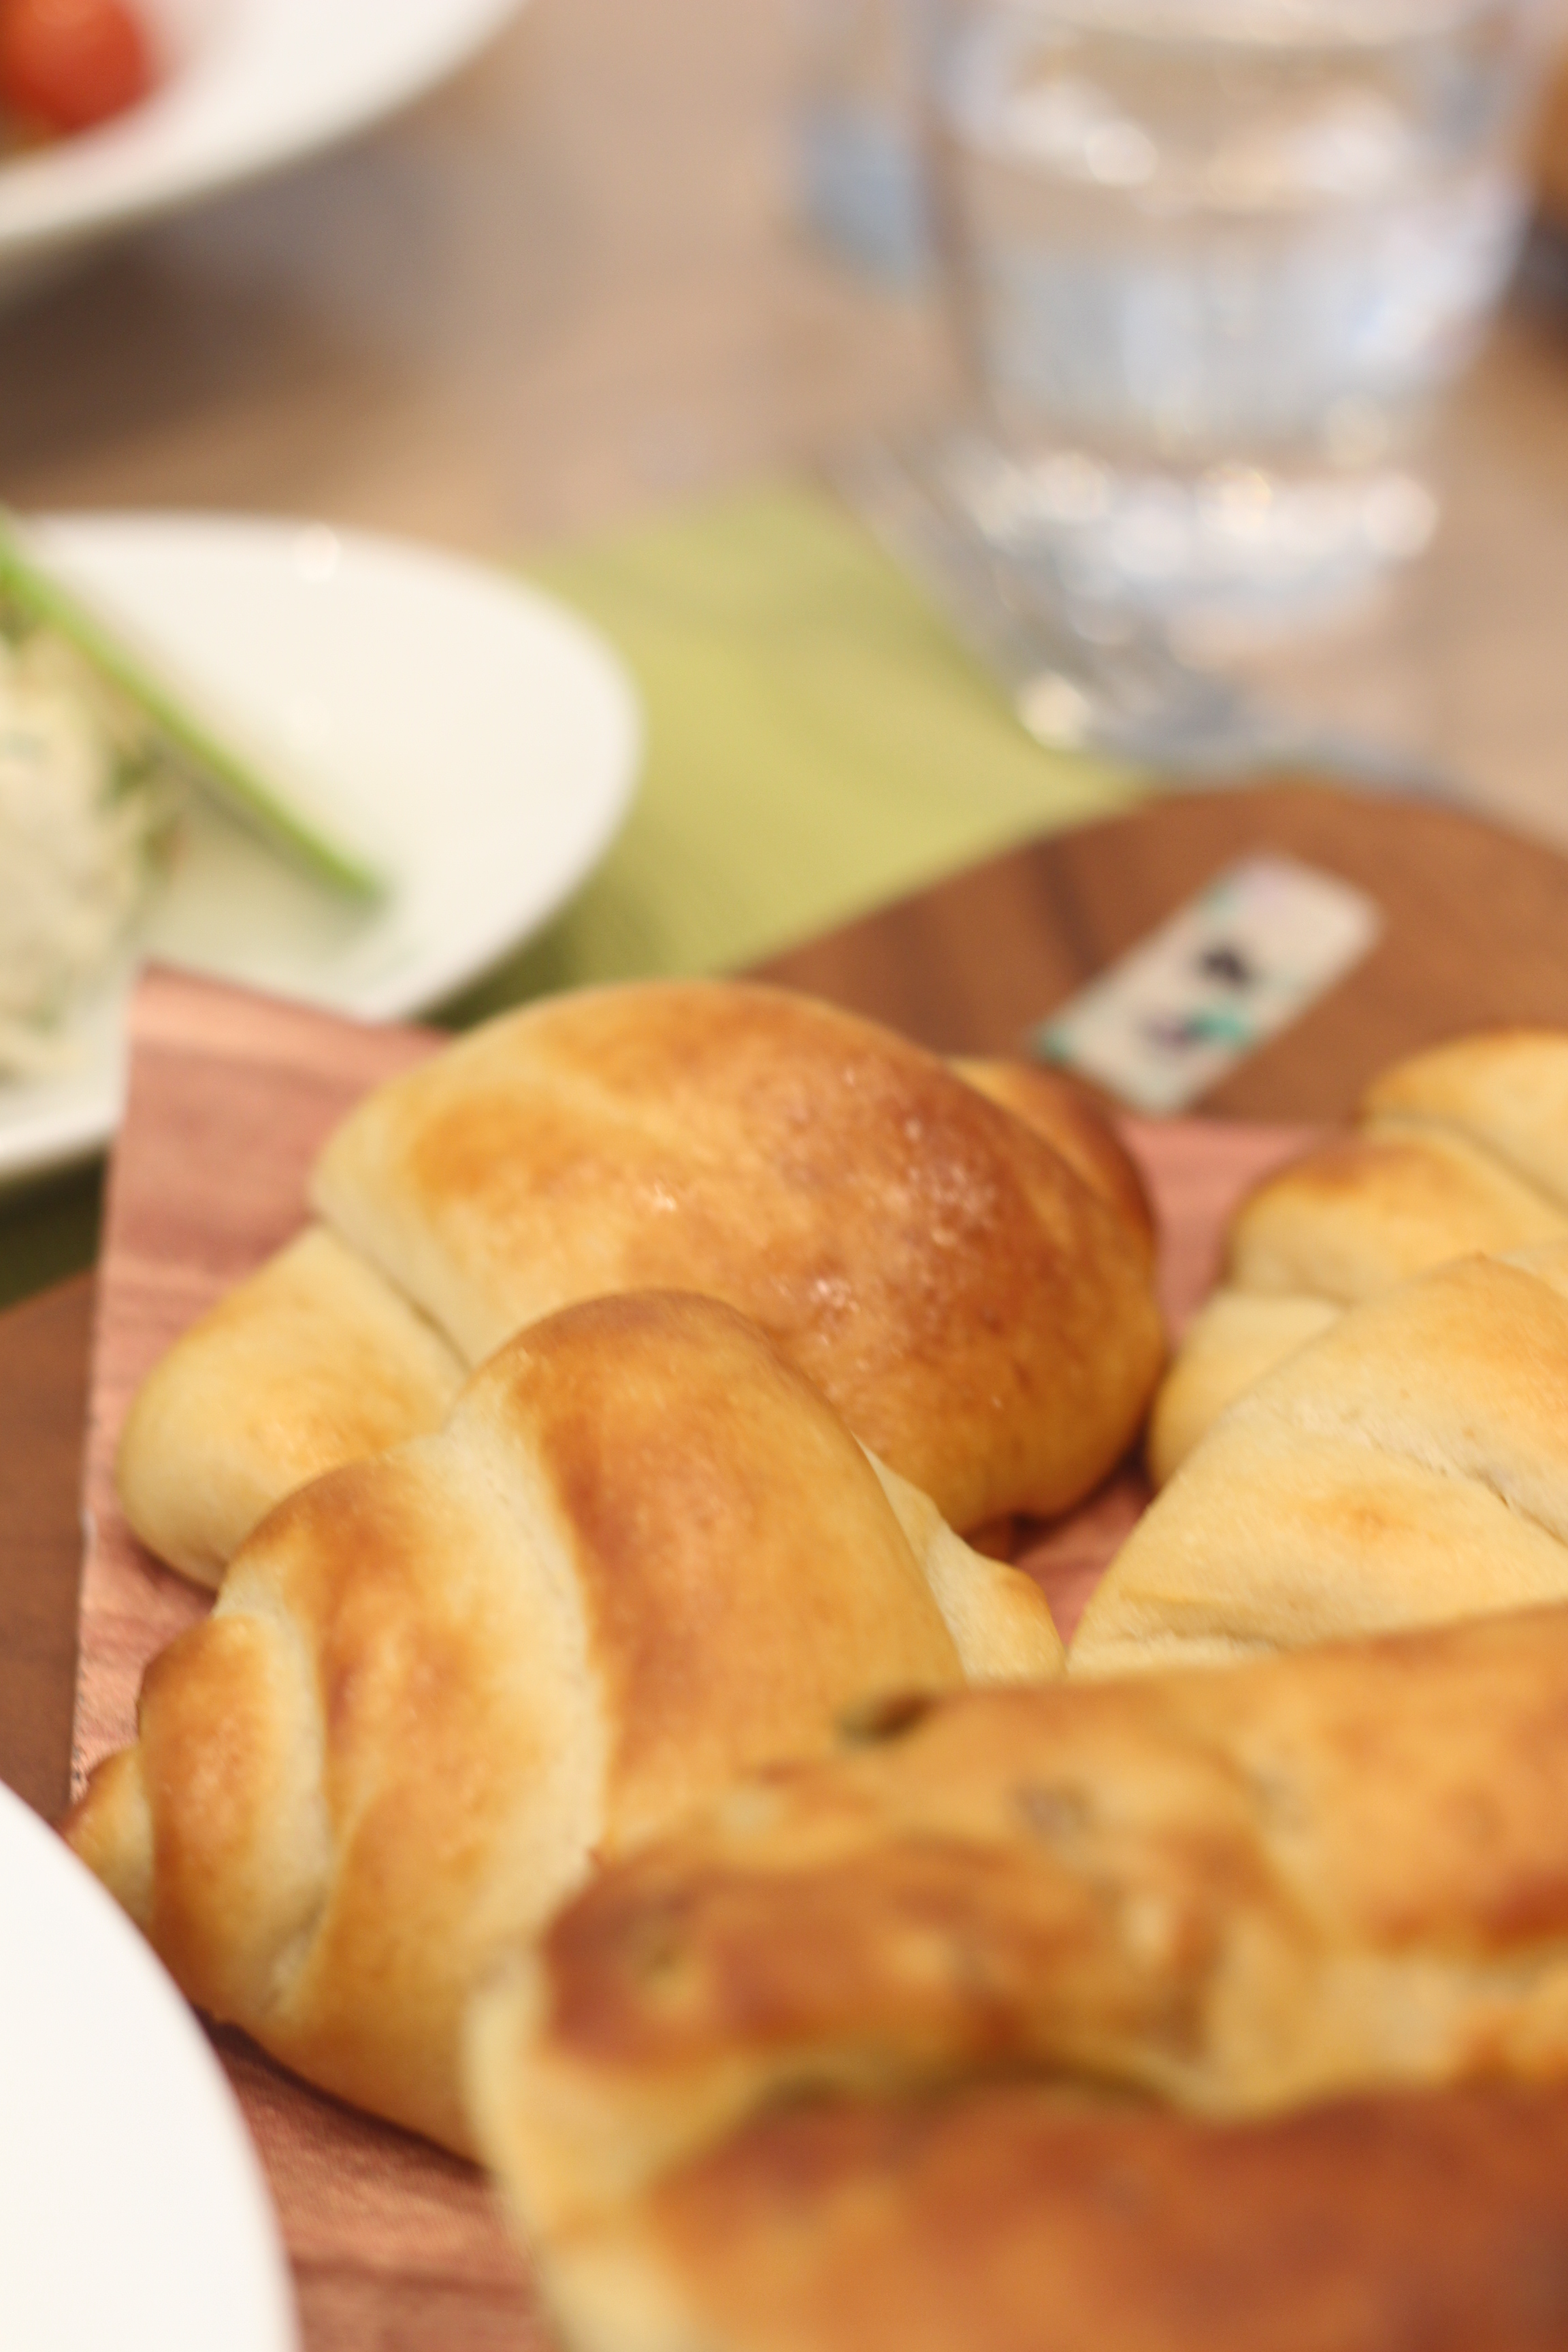 a-ta-sante糖質制限パン料理教室、阿倍野区西田辺。京都江部粉糖質制限パンベーシックコースⅣ期、ナッツブレッド&ロールパン。